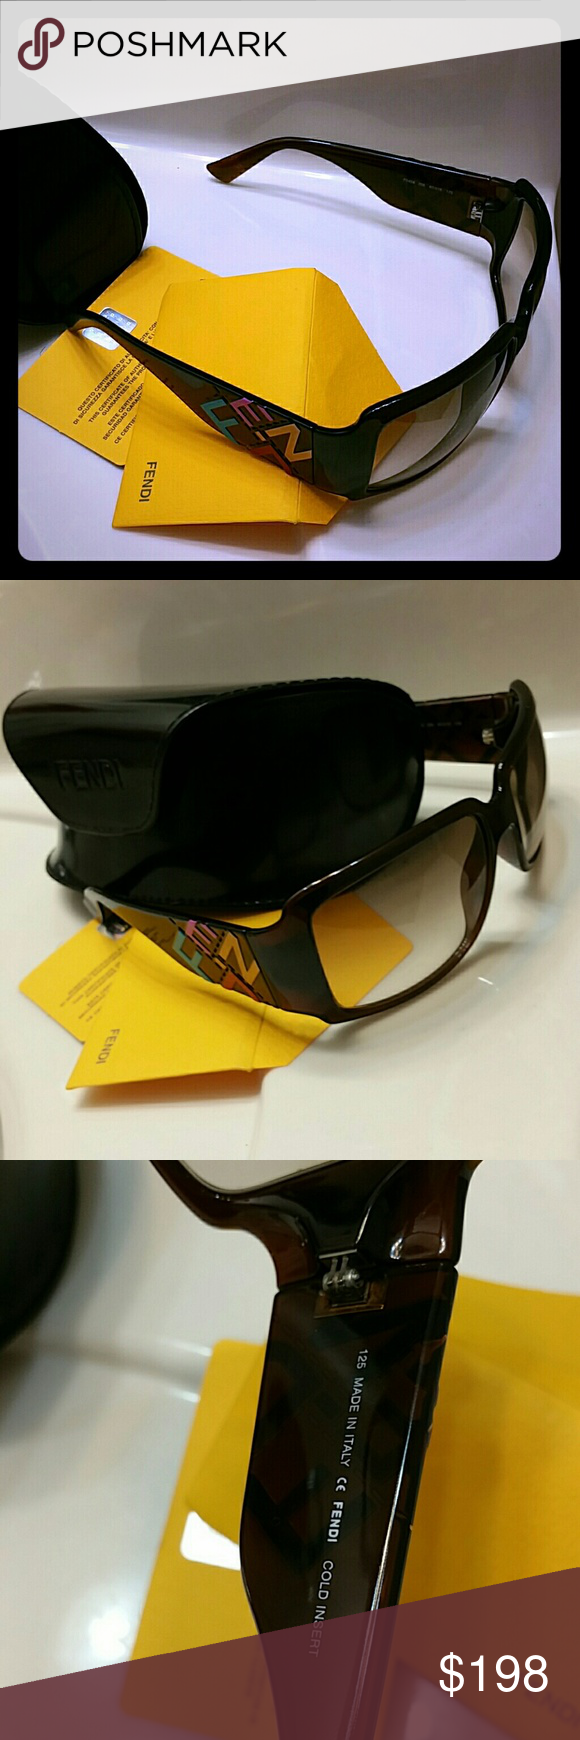 Authentic fendi sunglasses New Fendi Accessories Glasses